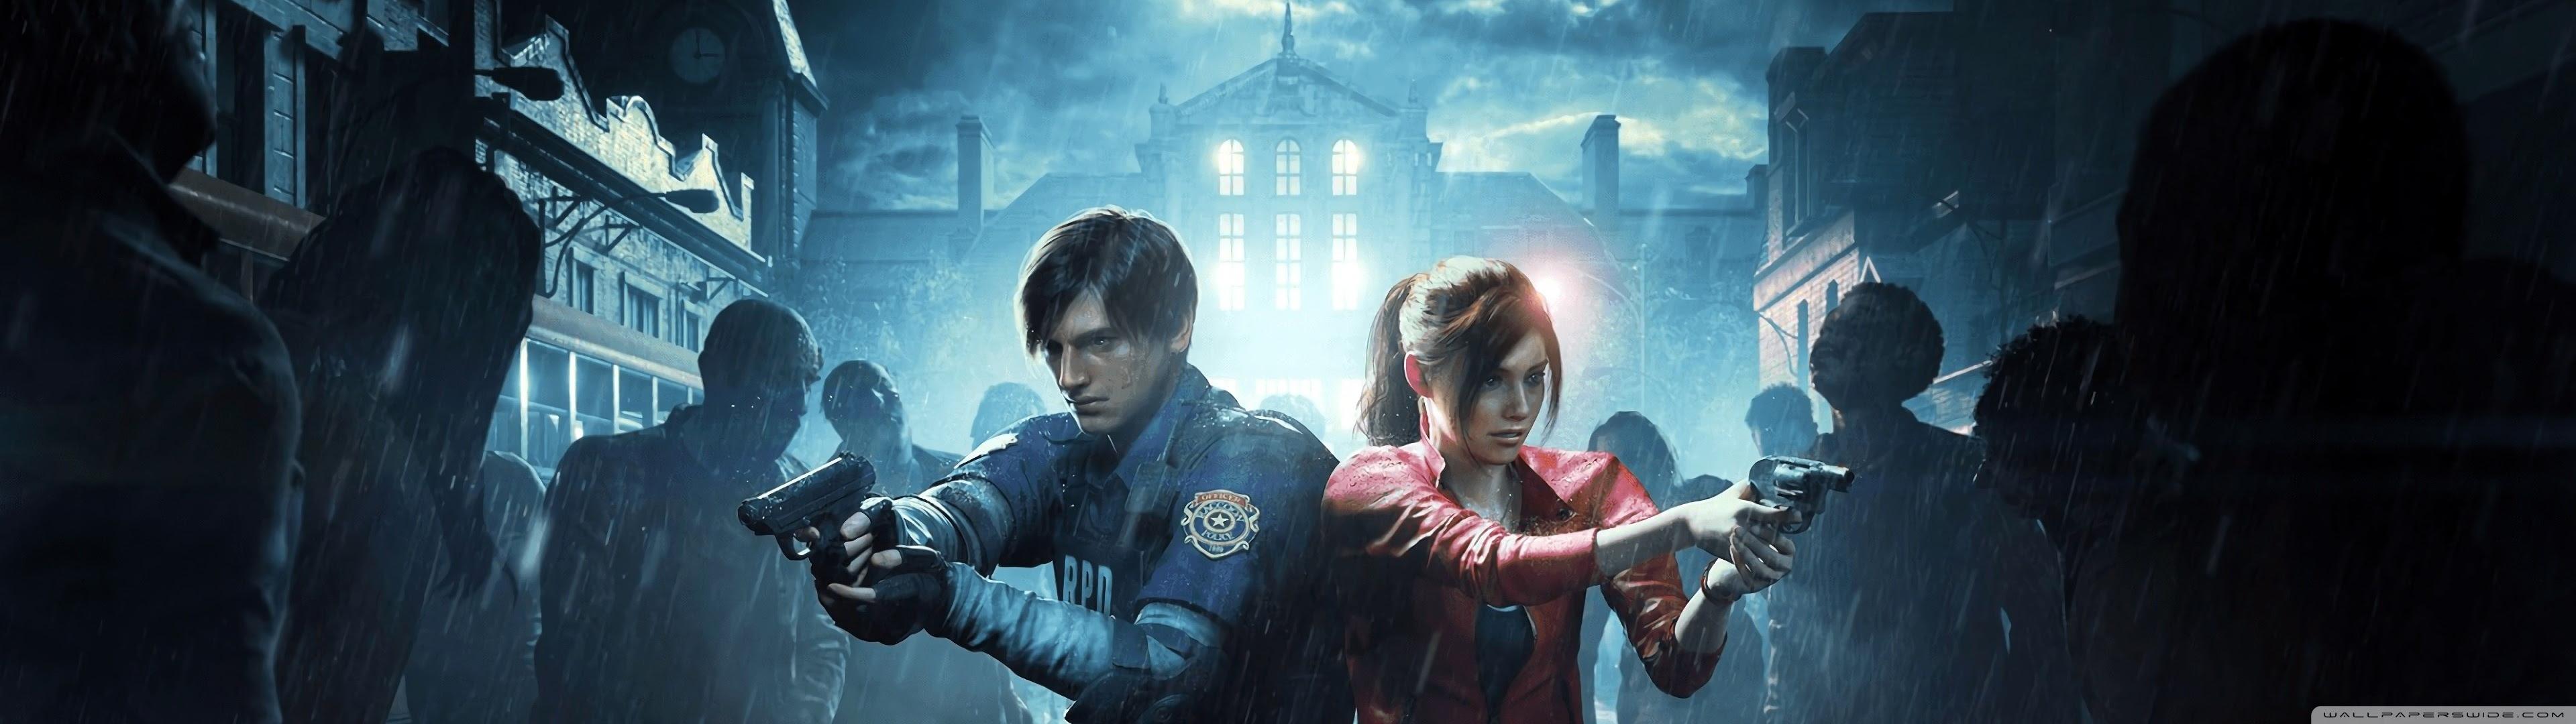 Resident Evil 2 2019 Video Game Ultra Hd Desktop Background